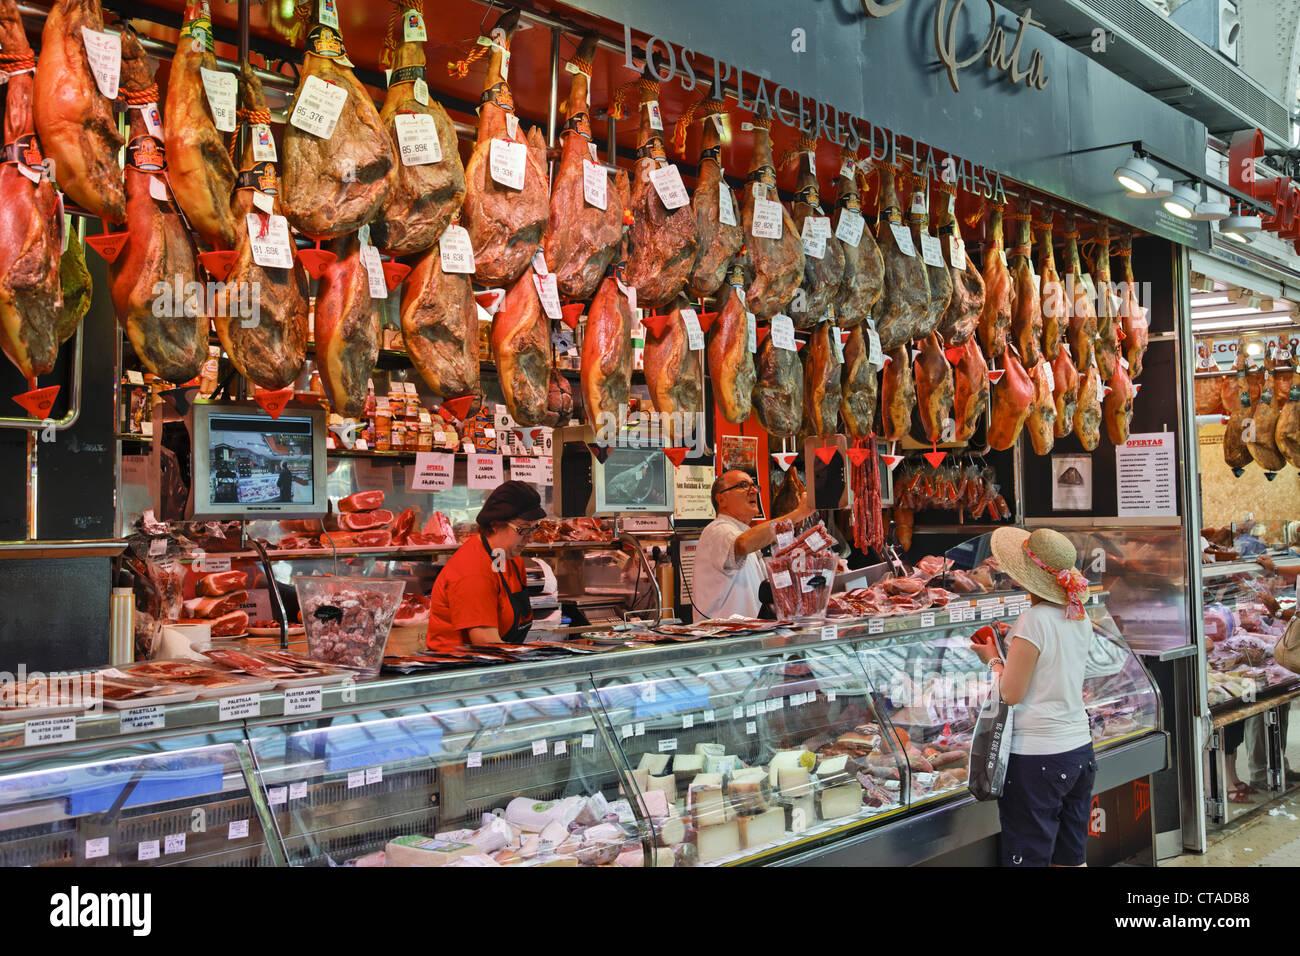 Ham at central market hall Mercado Central, Valencia, Spain, Europe - Stock Image